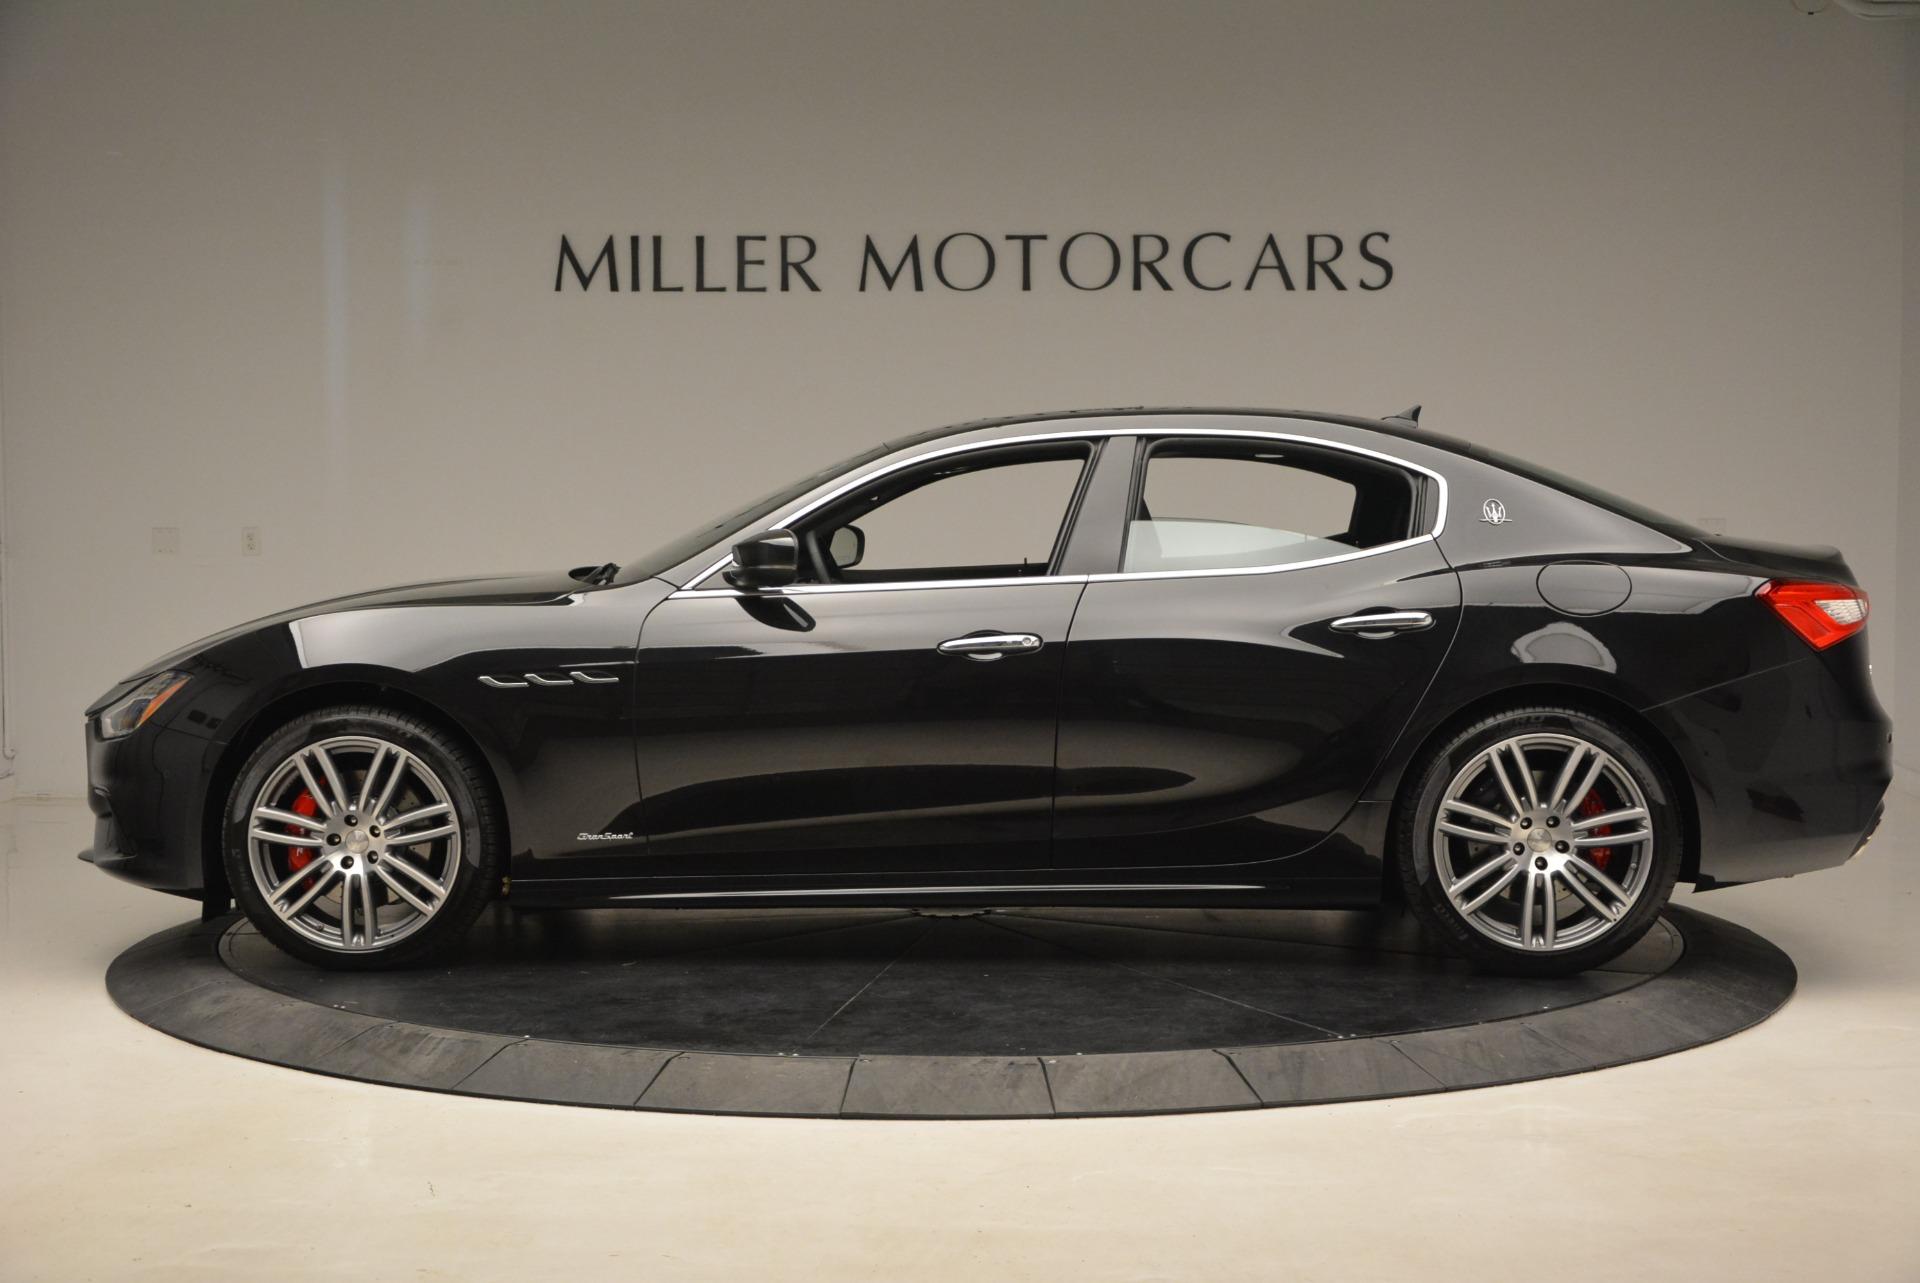 New 2018 Maserati Ghibli S Q4 Gransport For Sale In Westport, CT 1950_p3